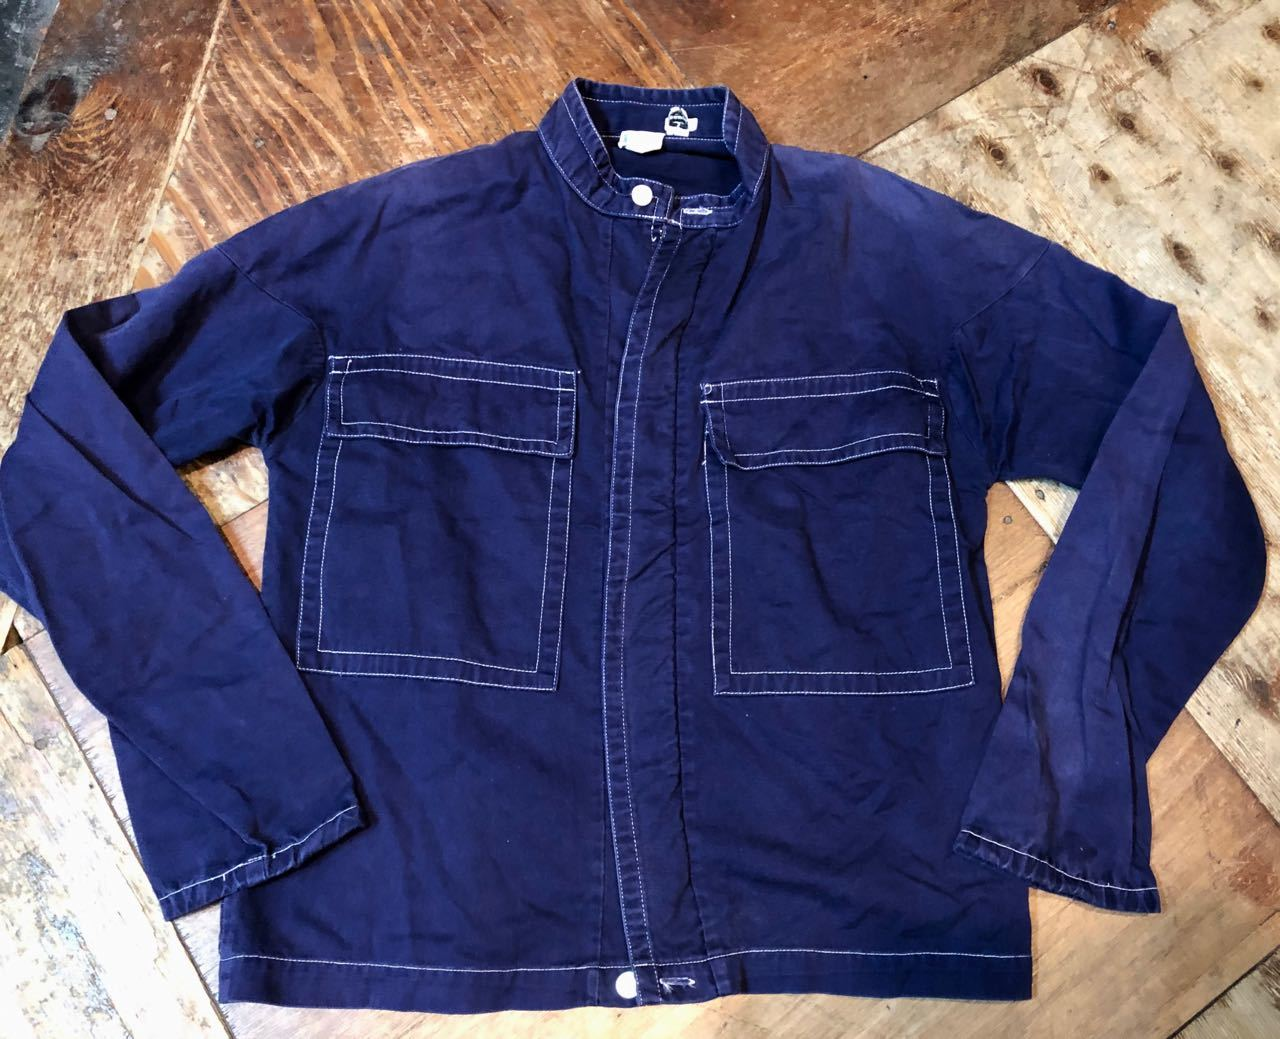 3月28日(木)入荷! 60s Penny\'s Towncraft all cotton Jacket!!_c0144020_14010279.jpg